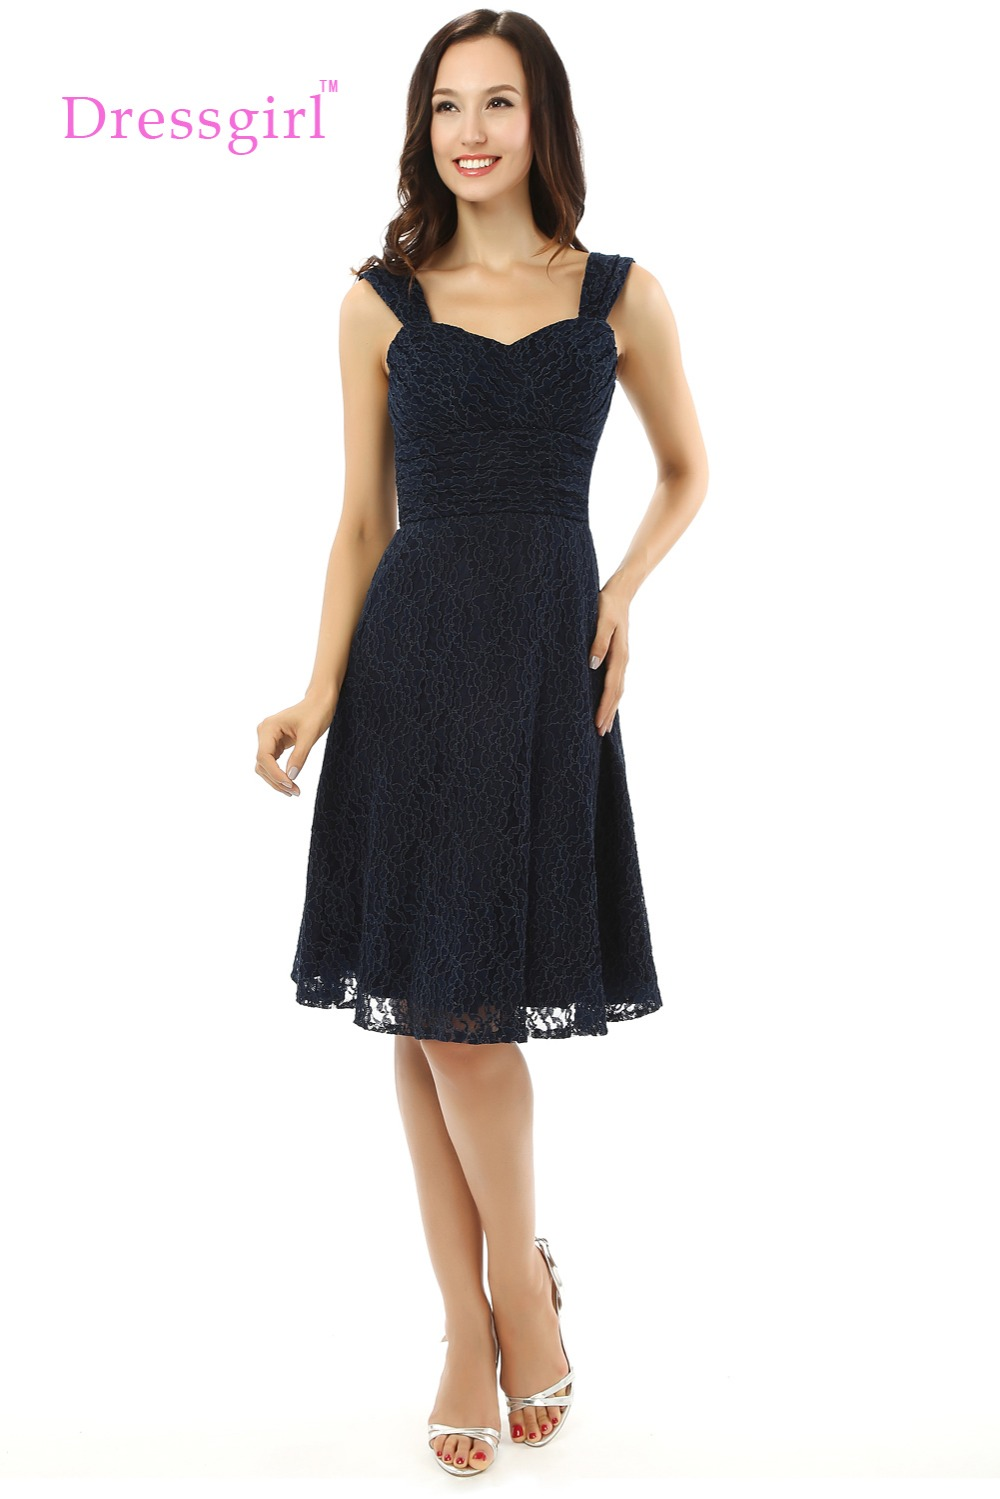 Black dress under knee - Dressgirl 2017 Cheap Bridesmaid Dresses Under 50 A Line Sweetheart Knee Length Navy Blue Lace